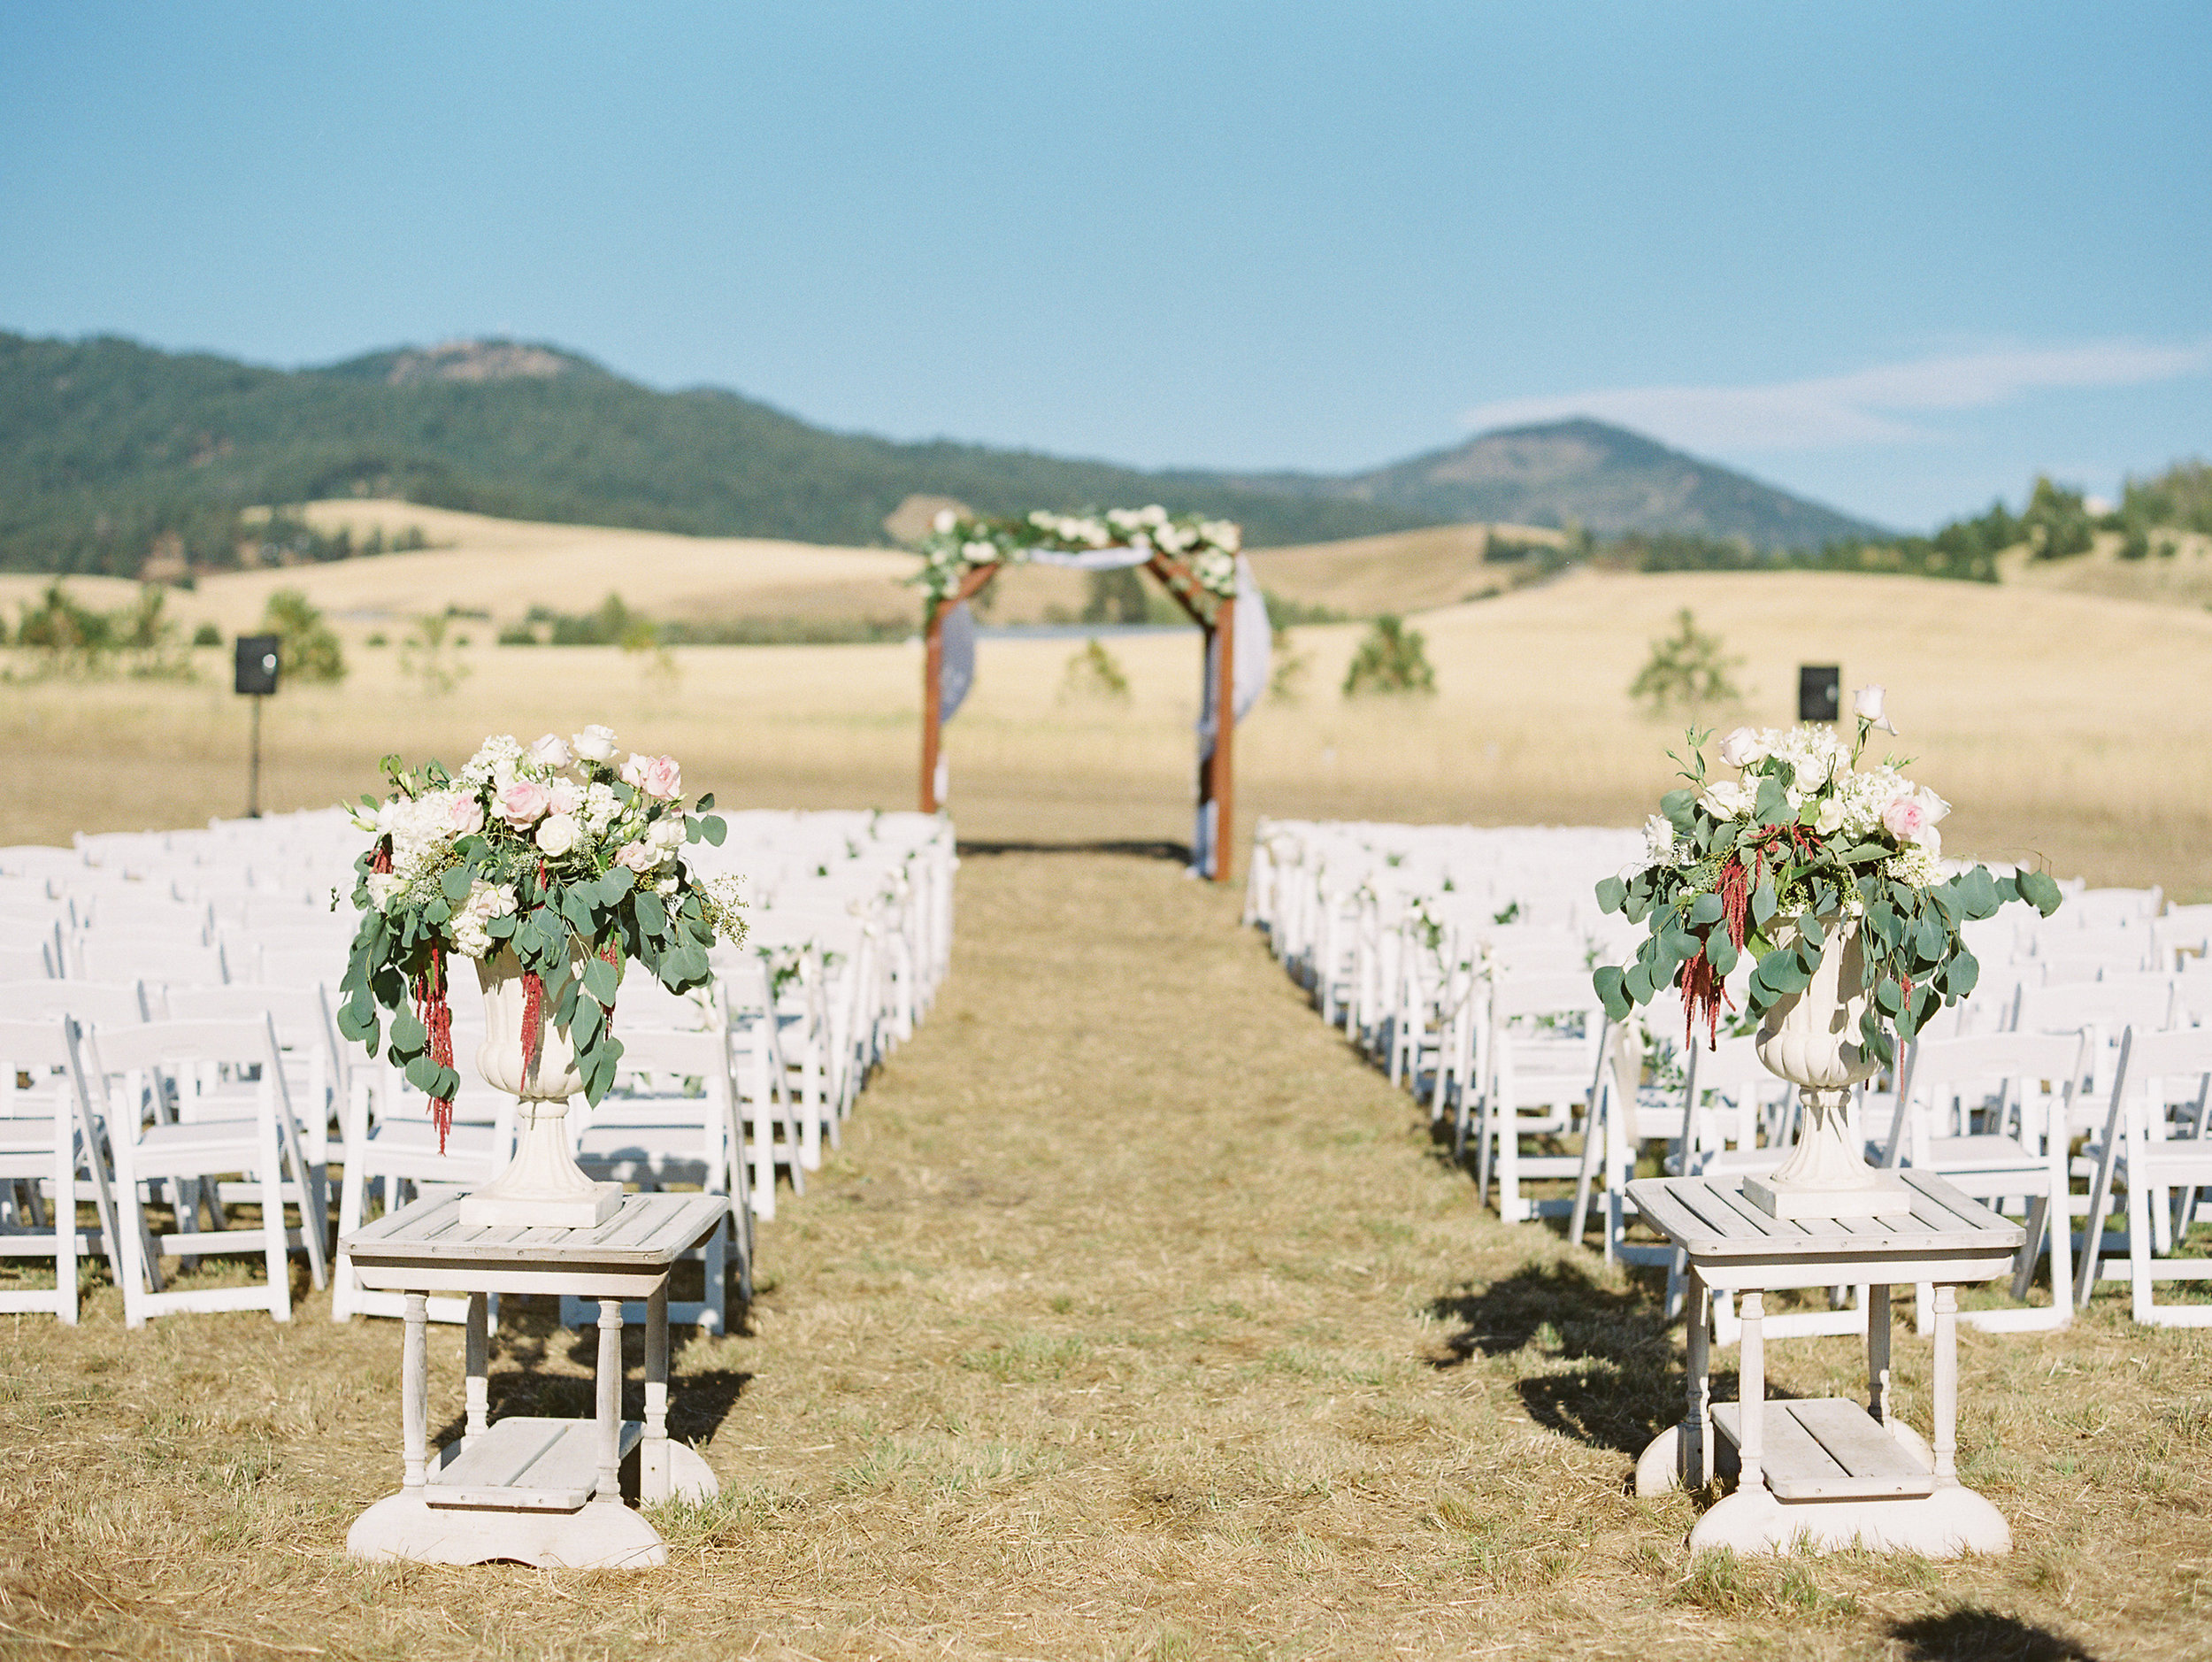 Idaho-Field-Forest-Wedding-Film-Photographer-Kristina-Adams-466.jpg